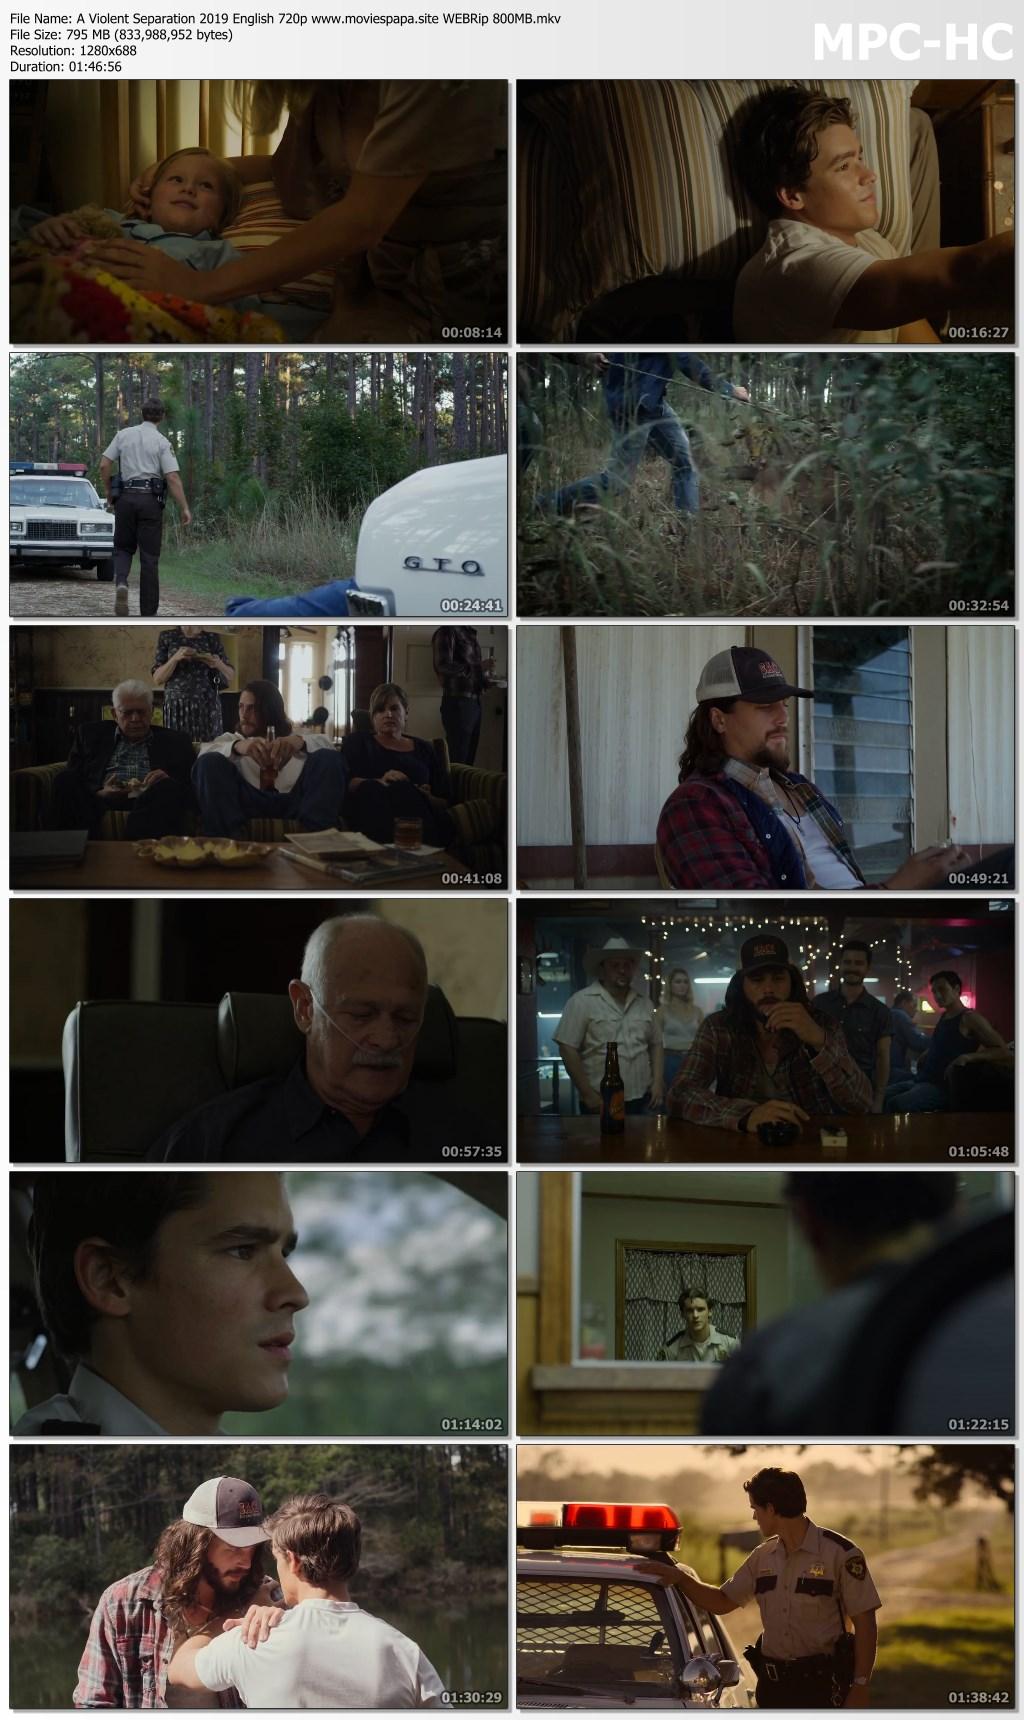 A Violent Separation 2019 English 720p HDRip Movie Download